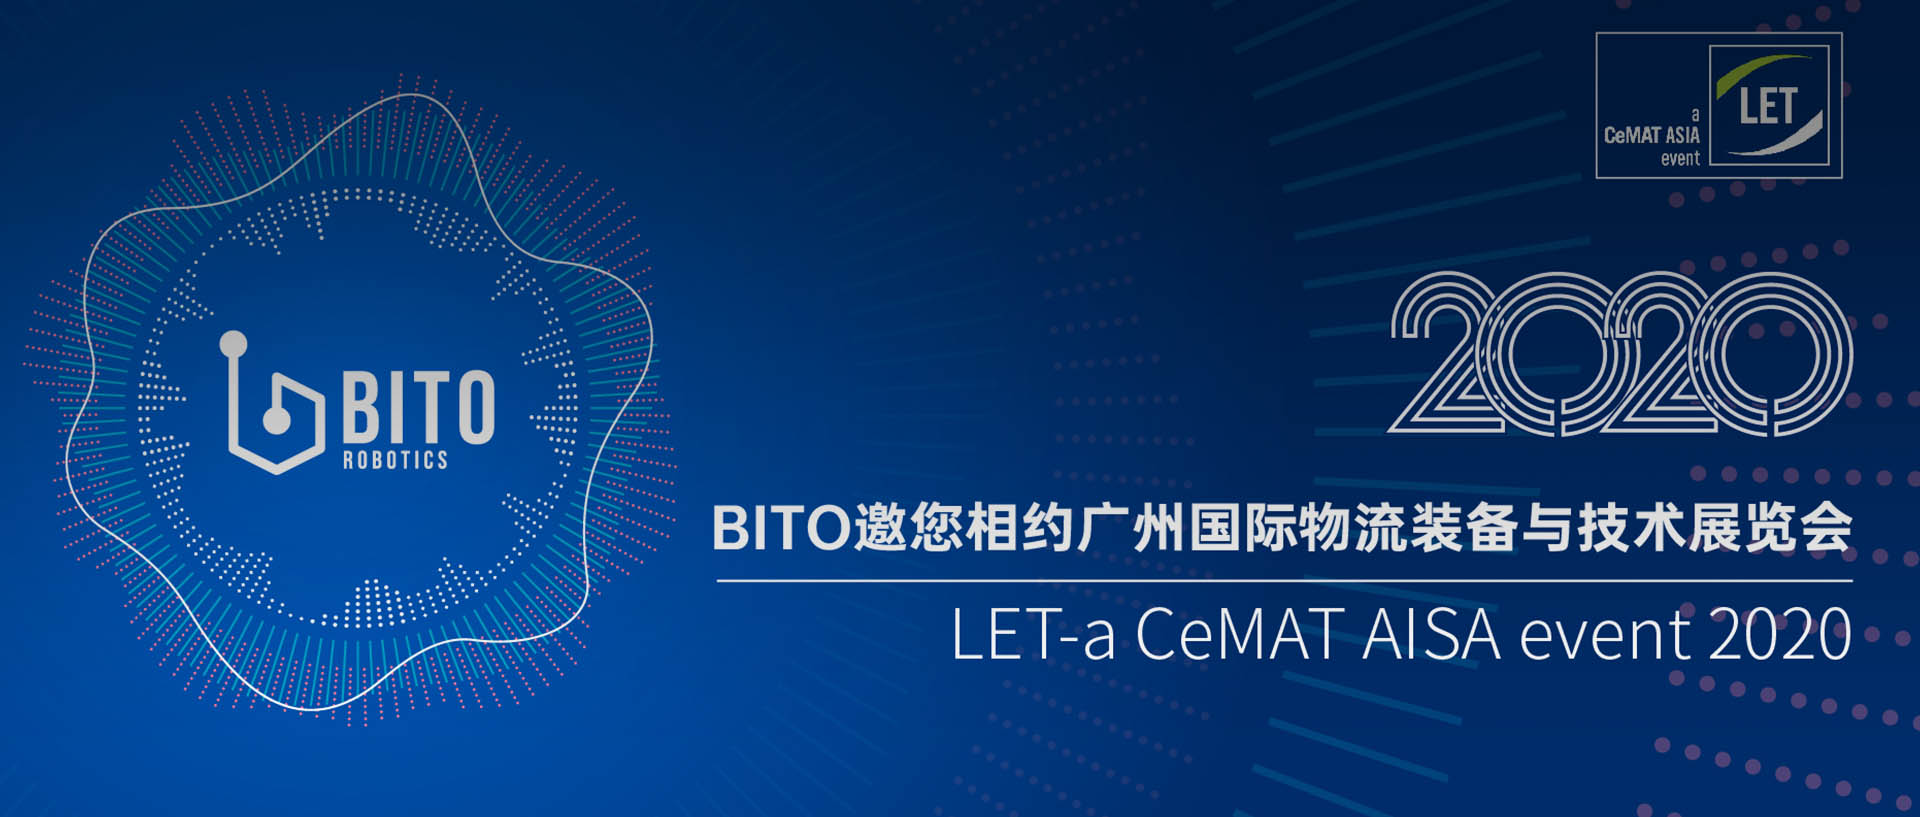 展会预告 | BITO邀您相约广州LET-a CeMAT AISA event 2020